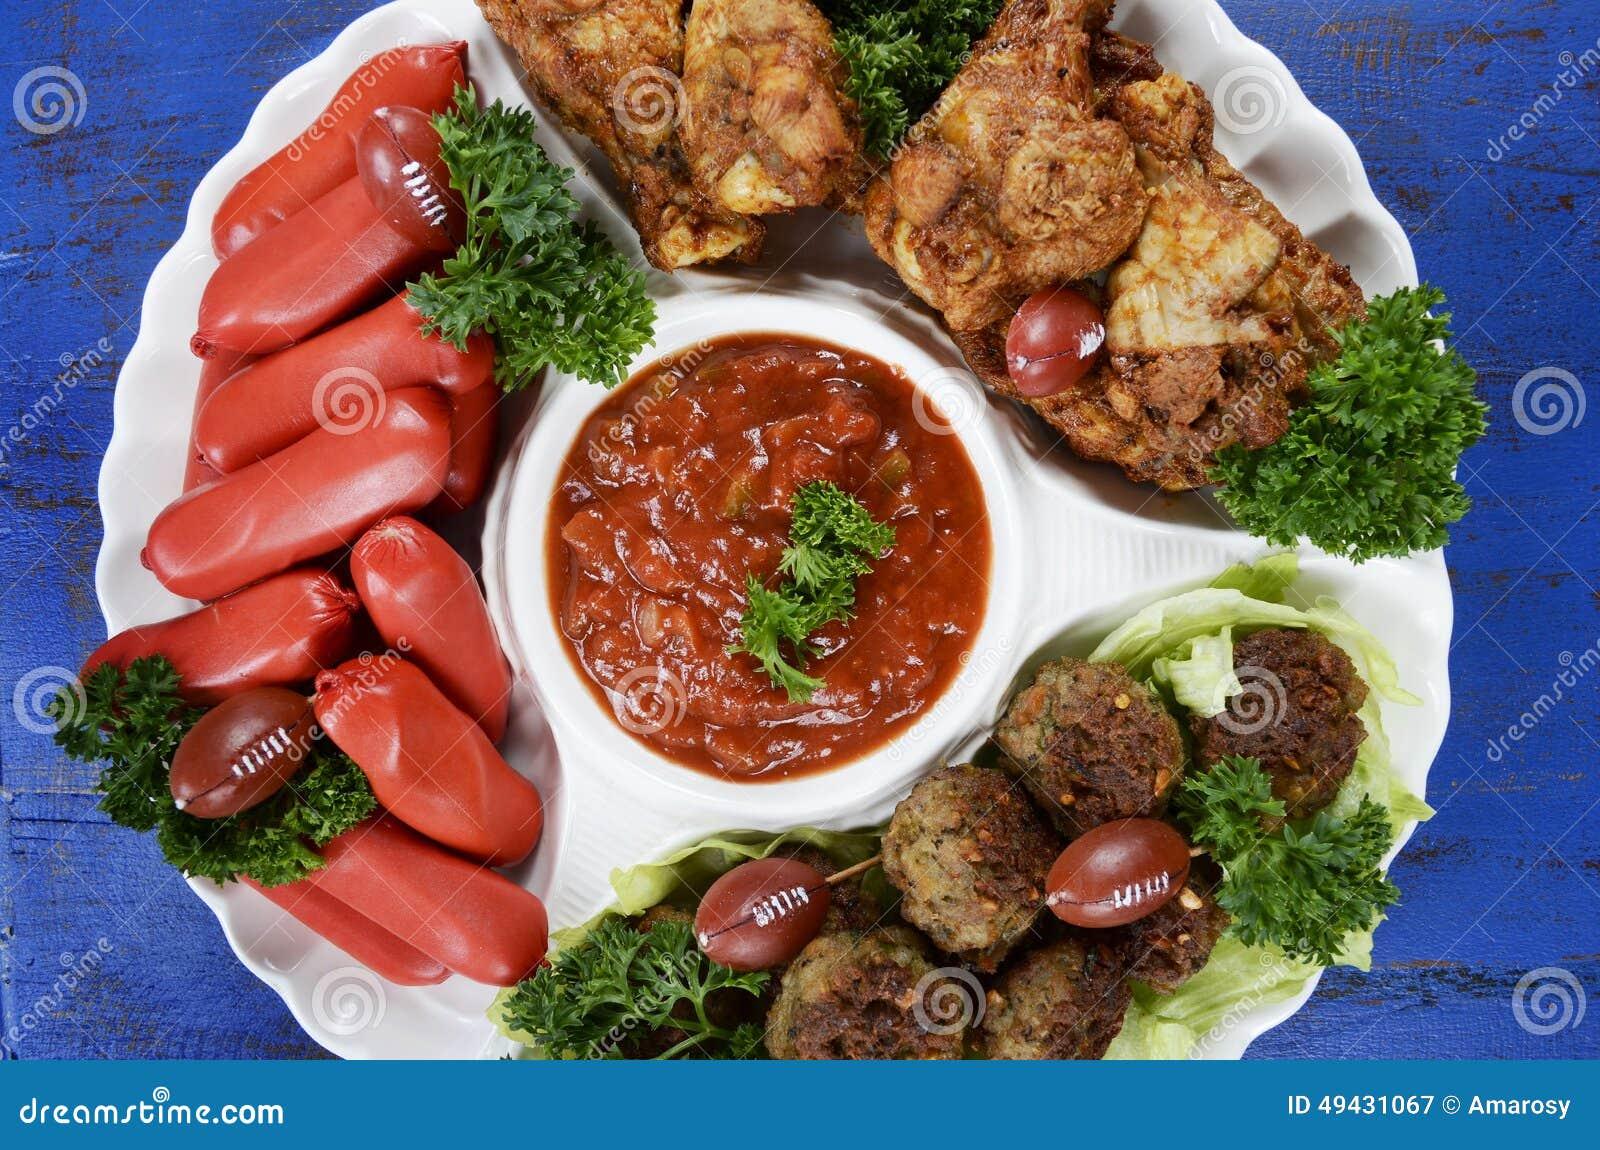 Football Party Food Platter Stock Image Image Of Frankfurters Football 49431067